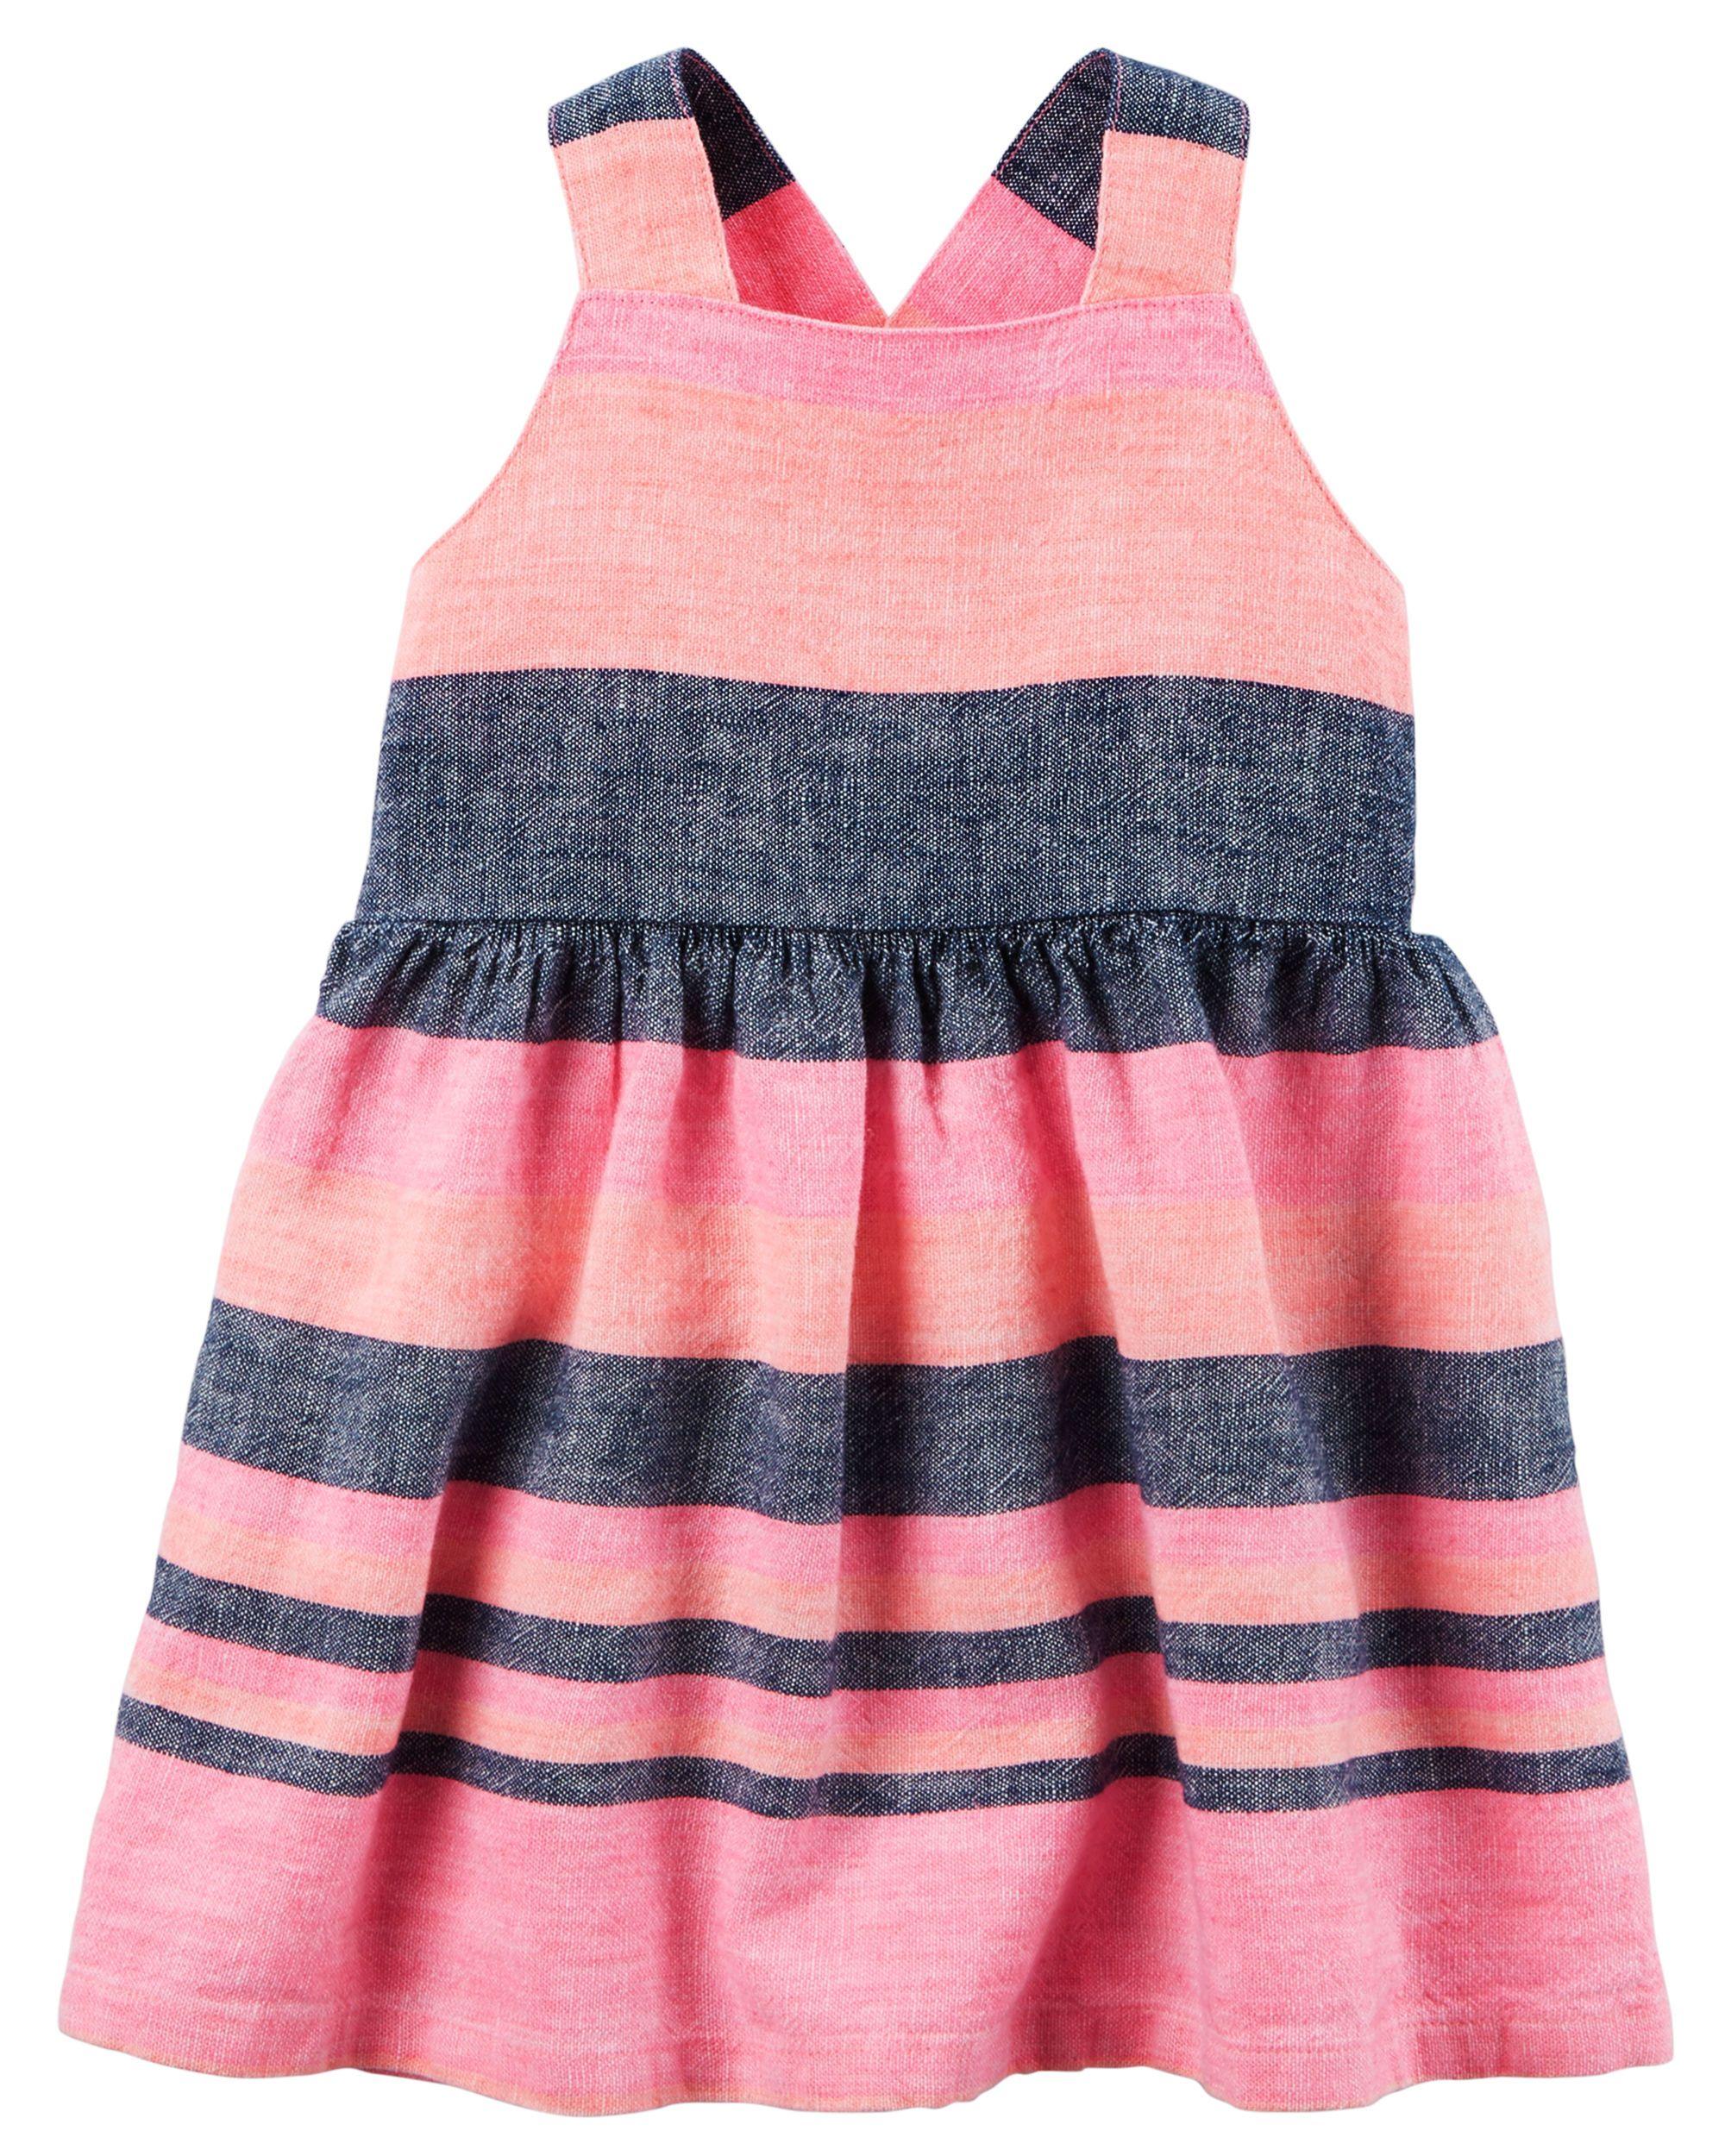 Neon Striped Dress